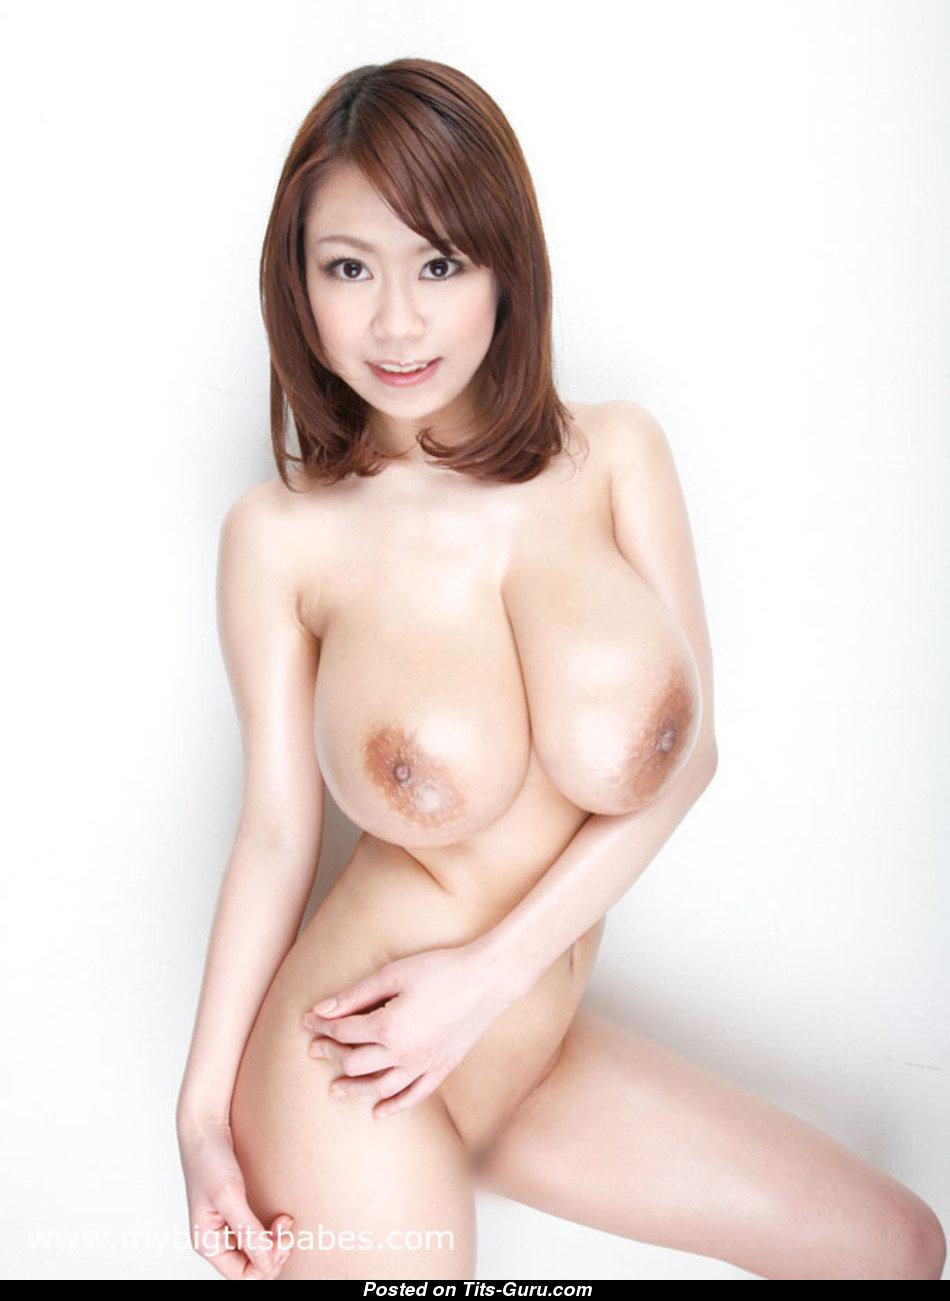 Asian labyboy sex movie